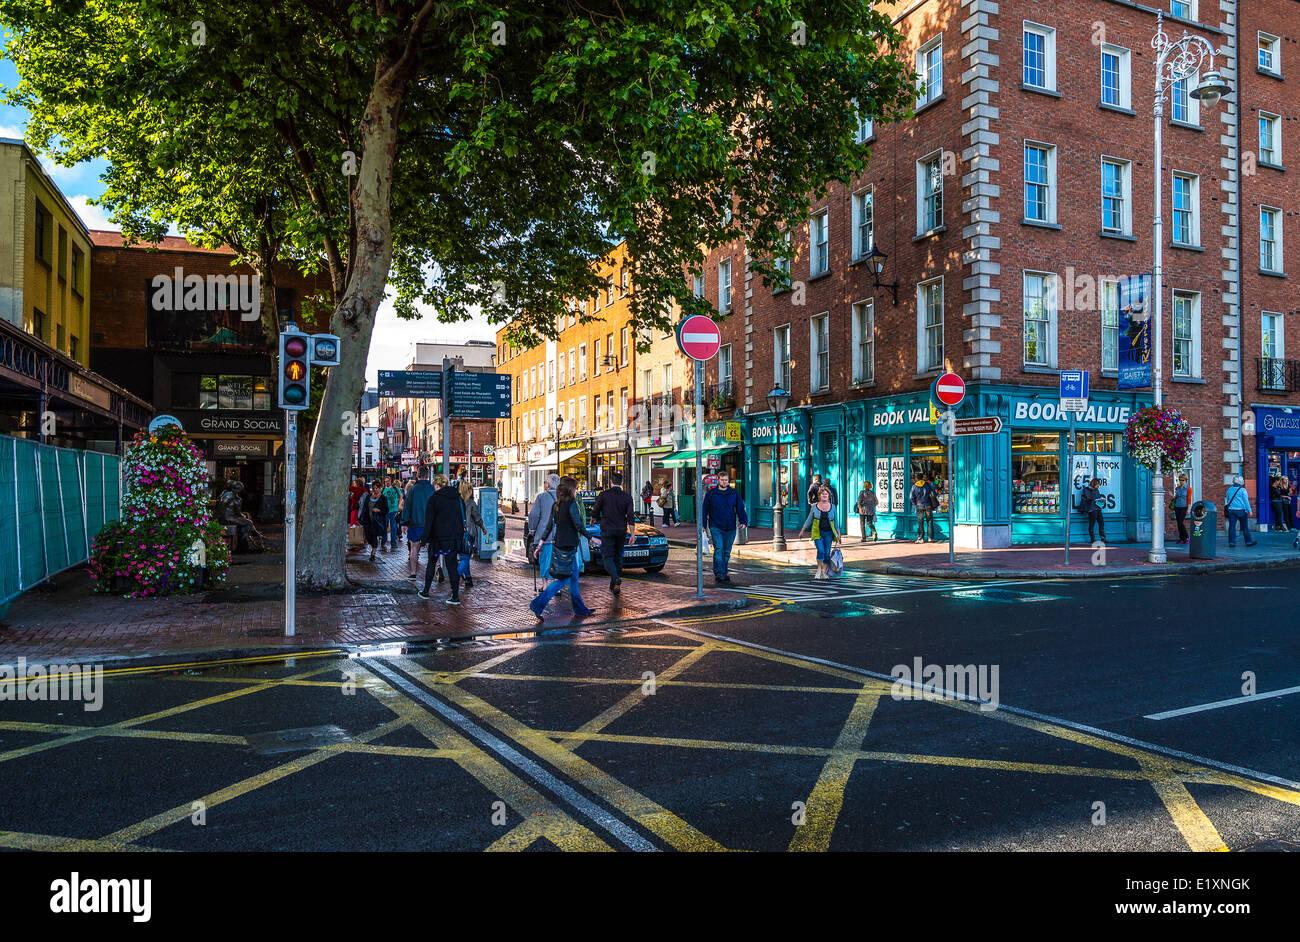 Ireland, Dublin, people in the Ormond Quay cross - Stock Image